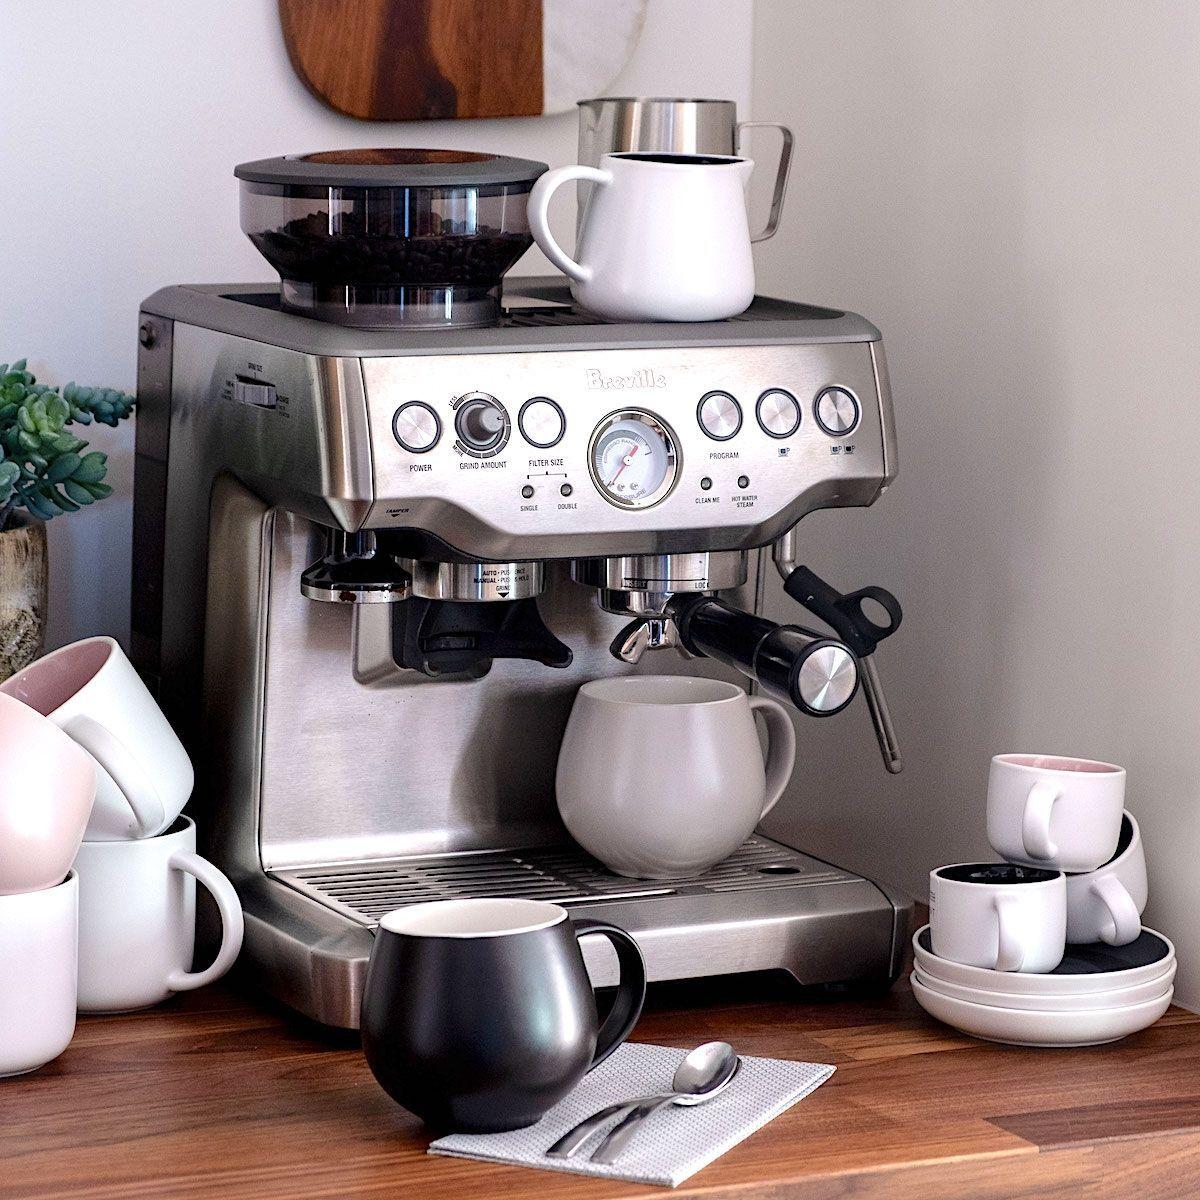 The Barista Express Espresso Machine By Breville In 2020 Espresso Machine Reviews Espresso Machine Espresso